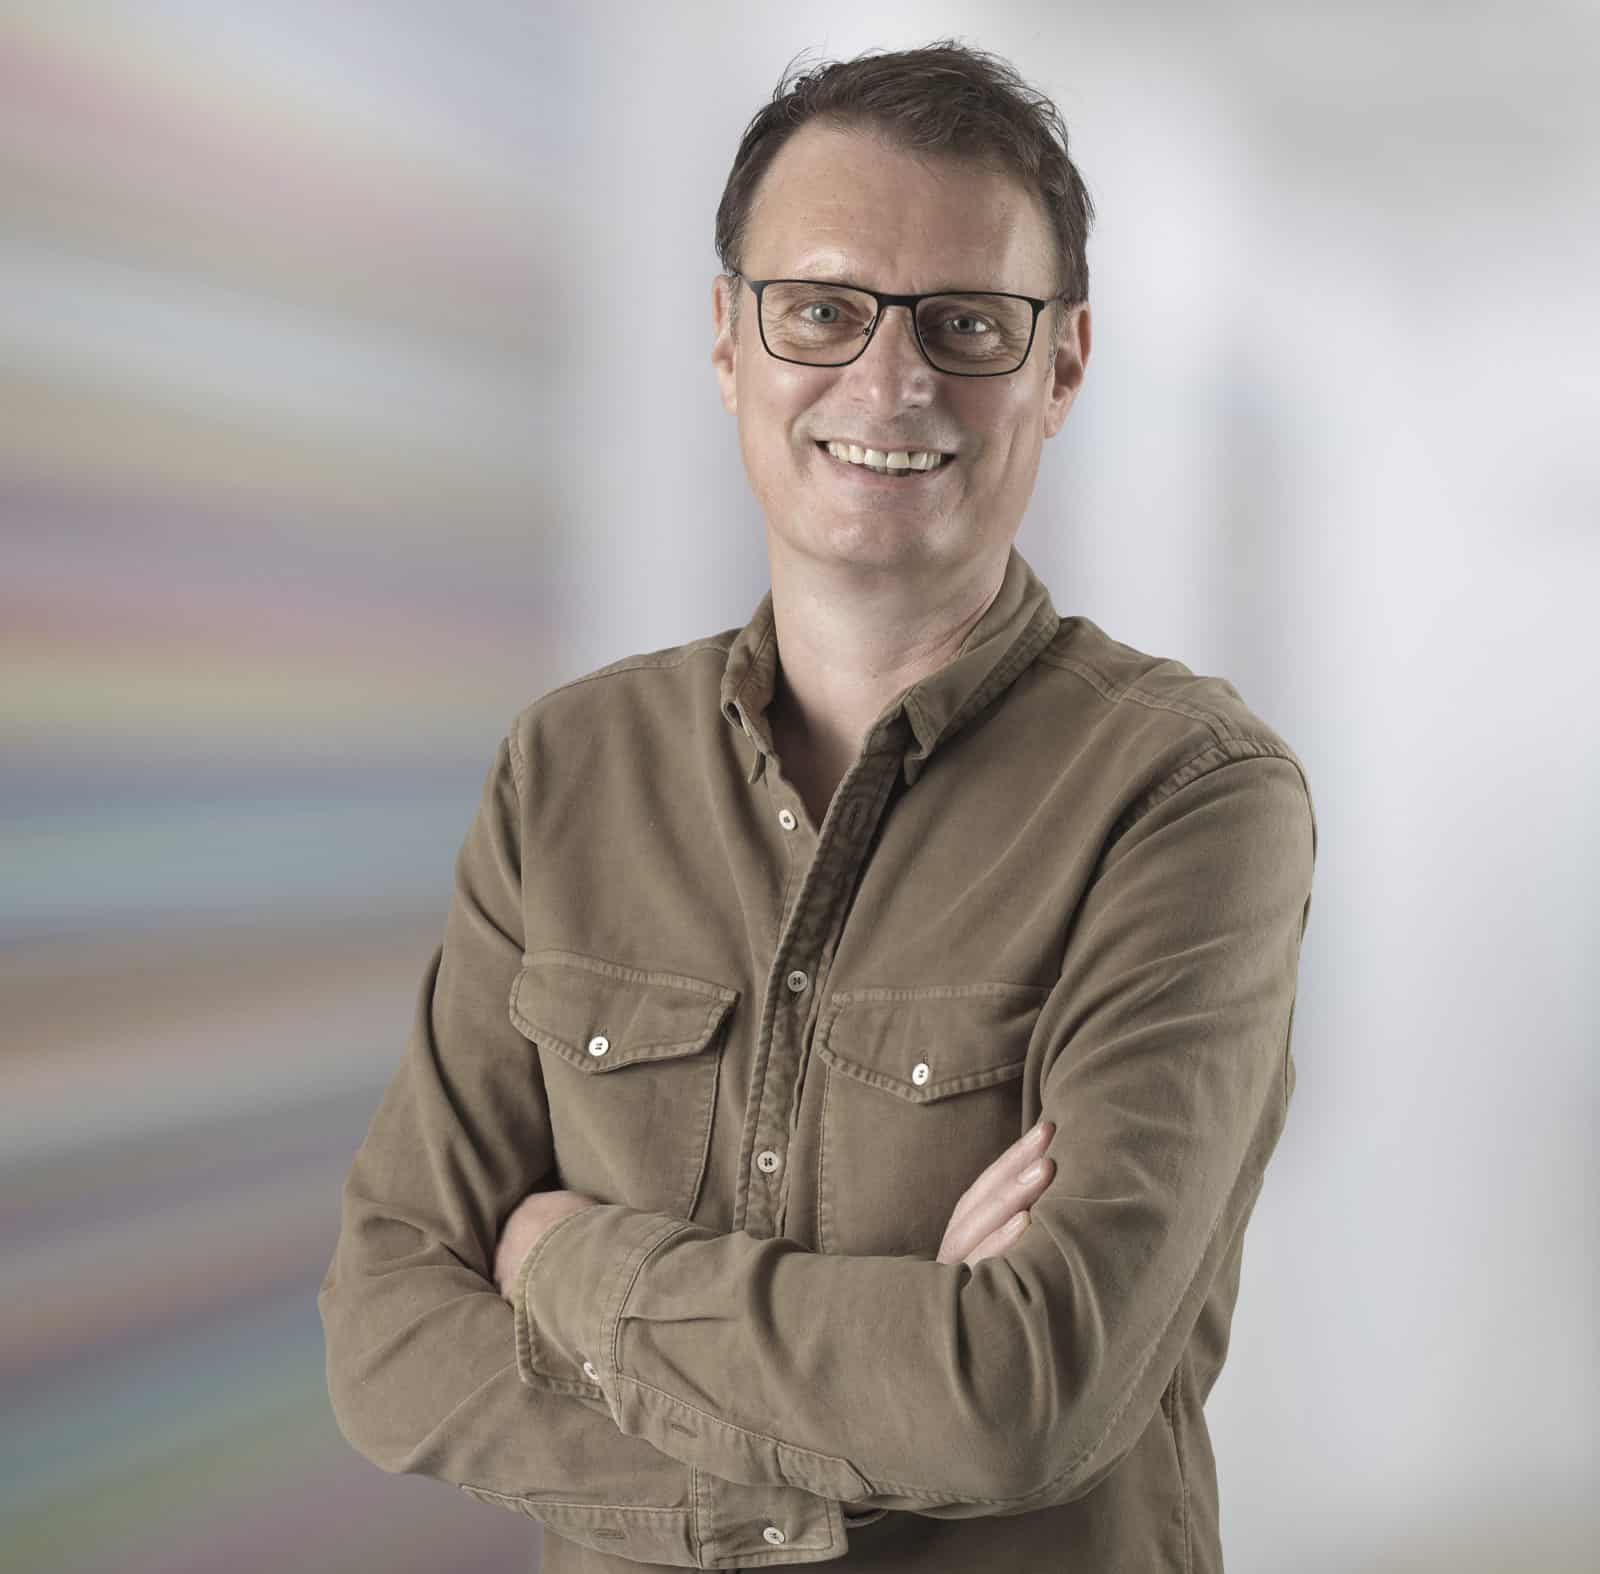 Michael Brorsen